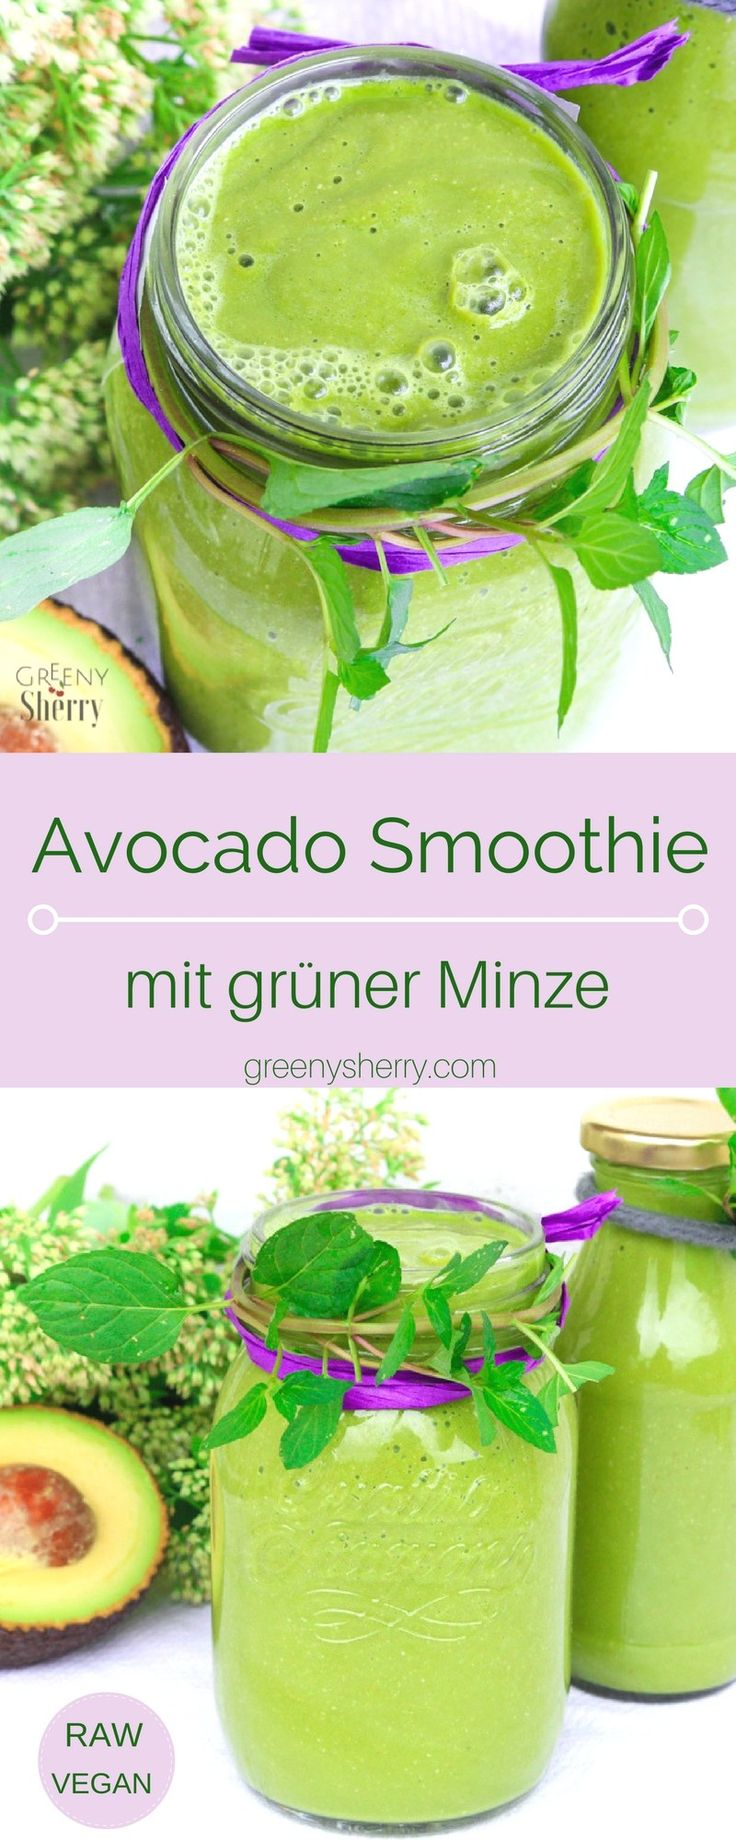 Cremiger Superfood Avocado Smoothie mit grüner Minze (vegan) www.greenysherry.com (Raw Vegan Recipes)